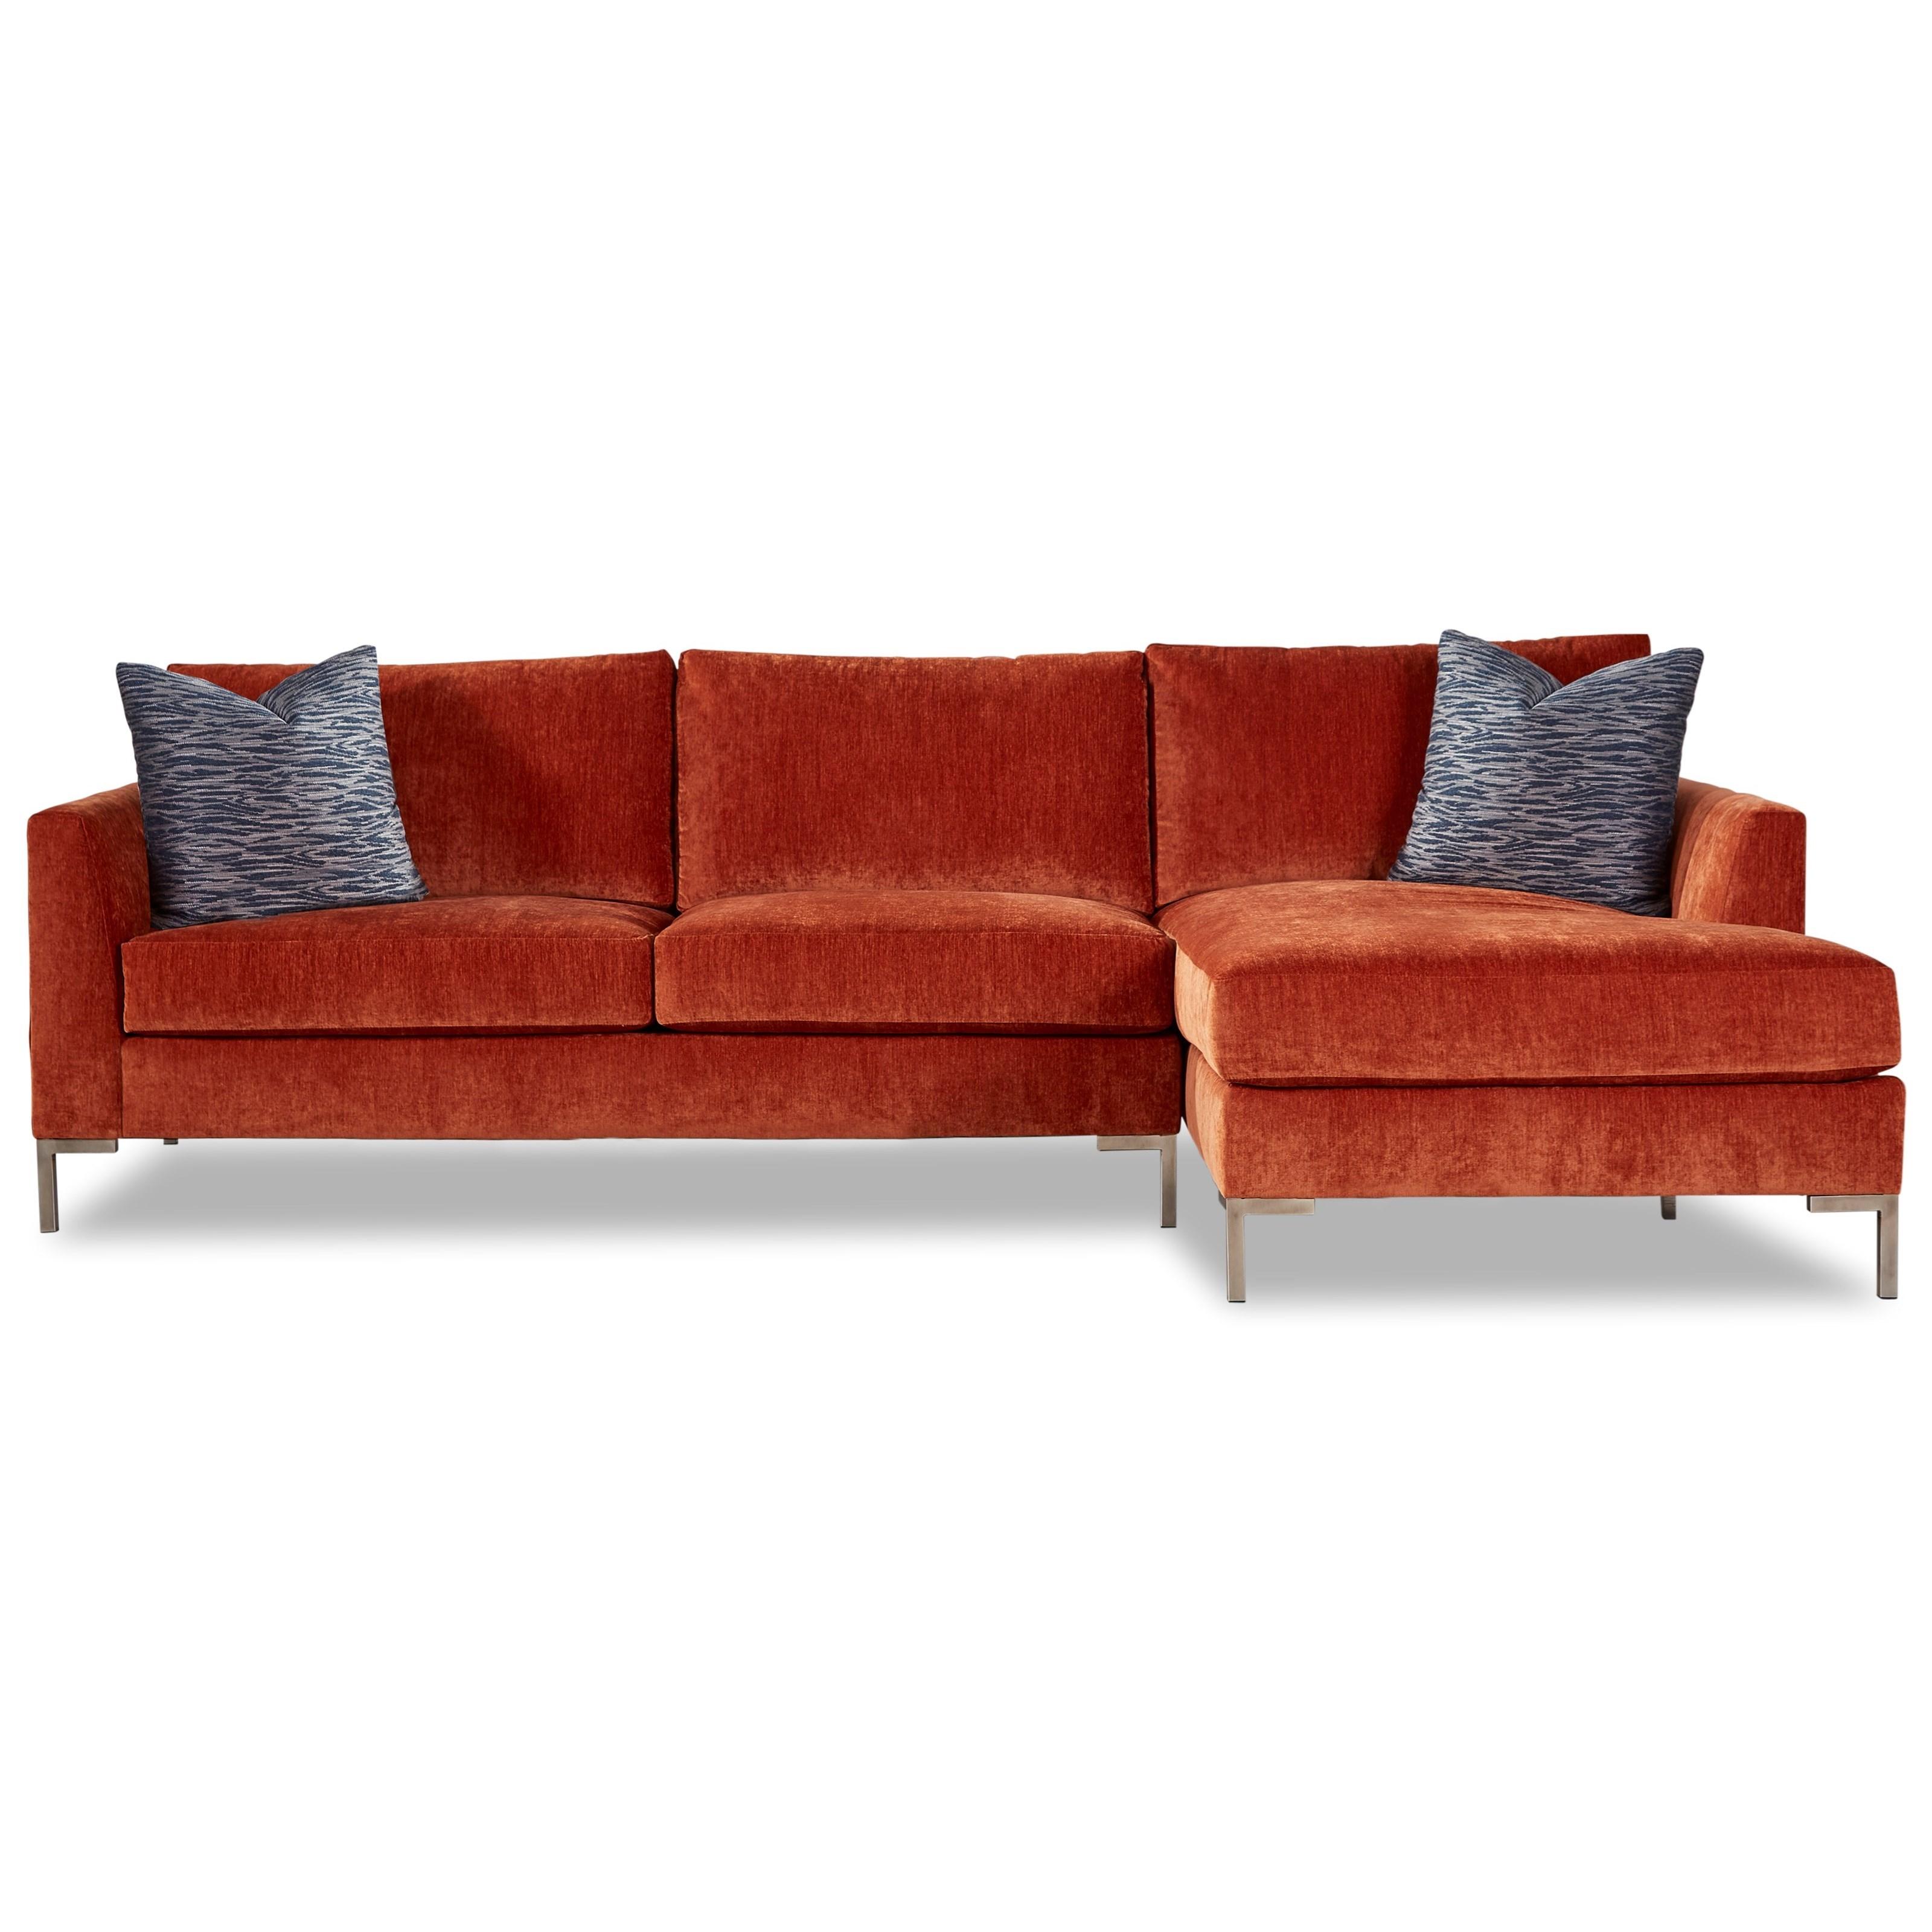 8014 Sectional Sofa by Geoffrey Alexander at Sprintz Furniture